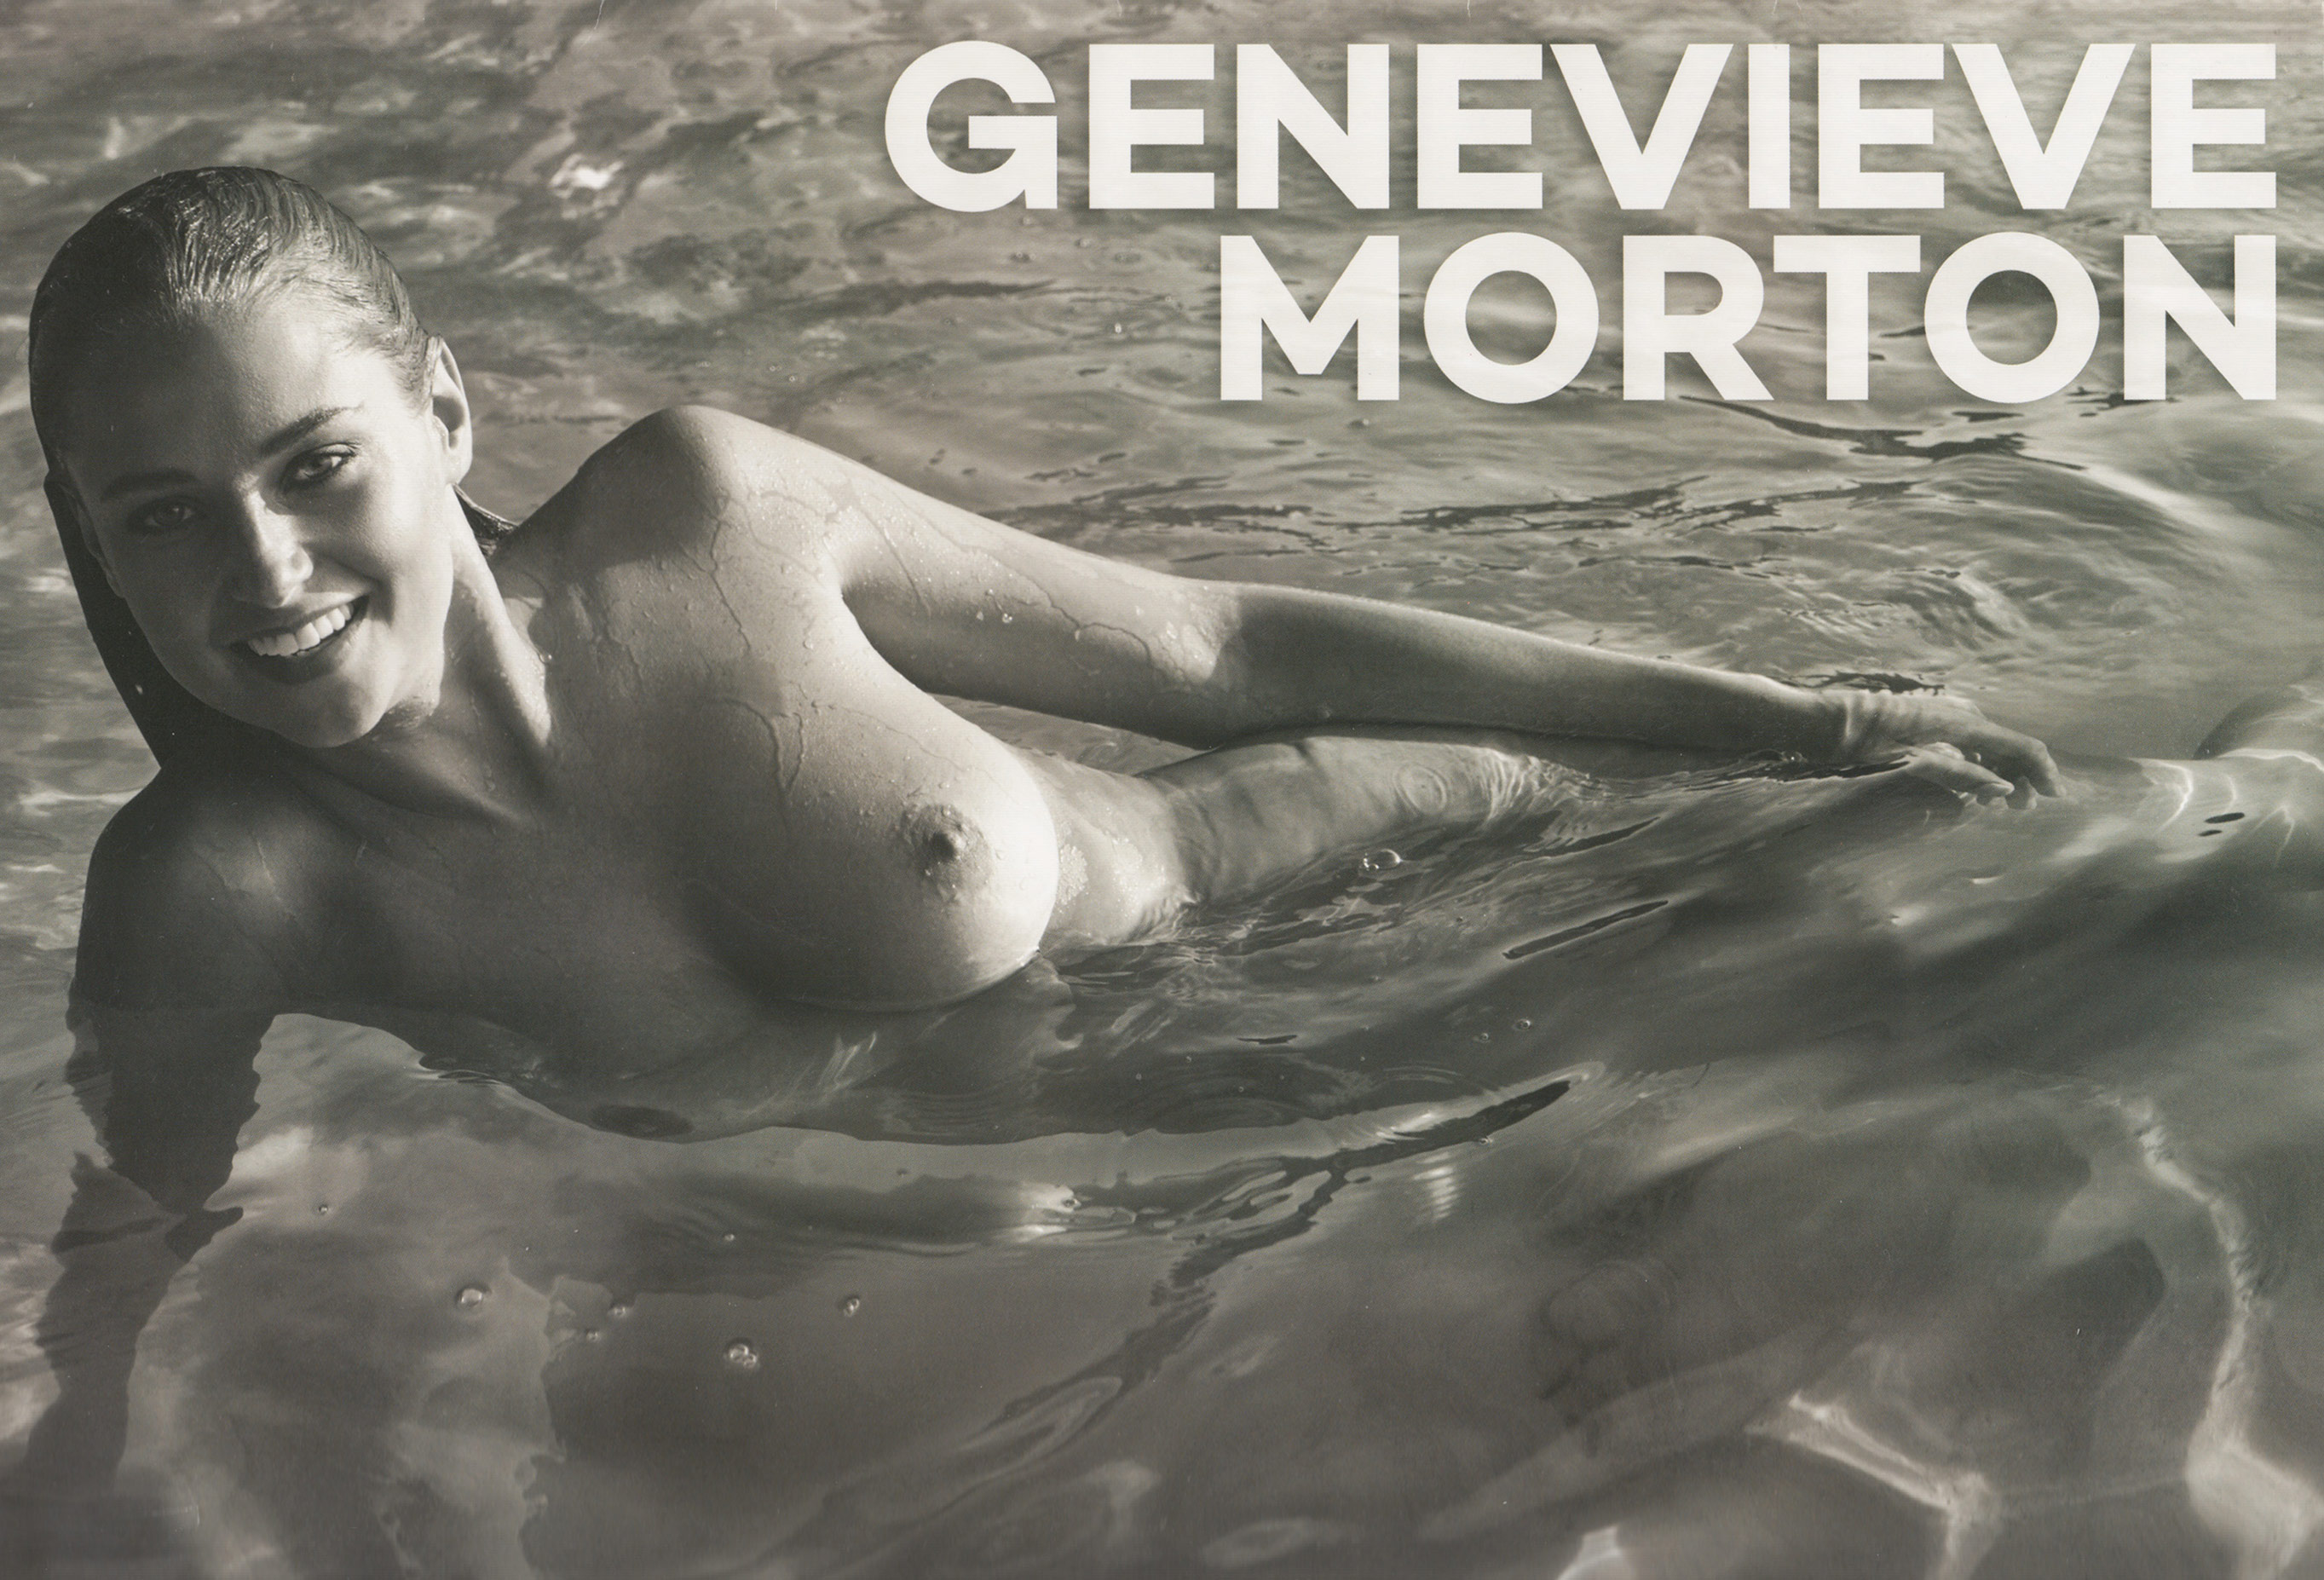 Эротический календарь модели Женевьевы Мортон / Genevieve Morton 2017 calendar / photo by Derek Riker